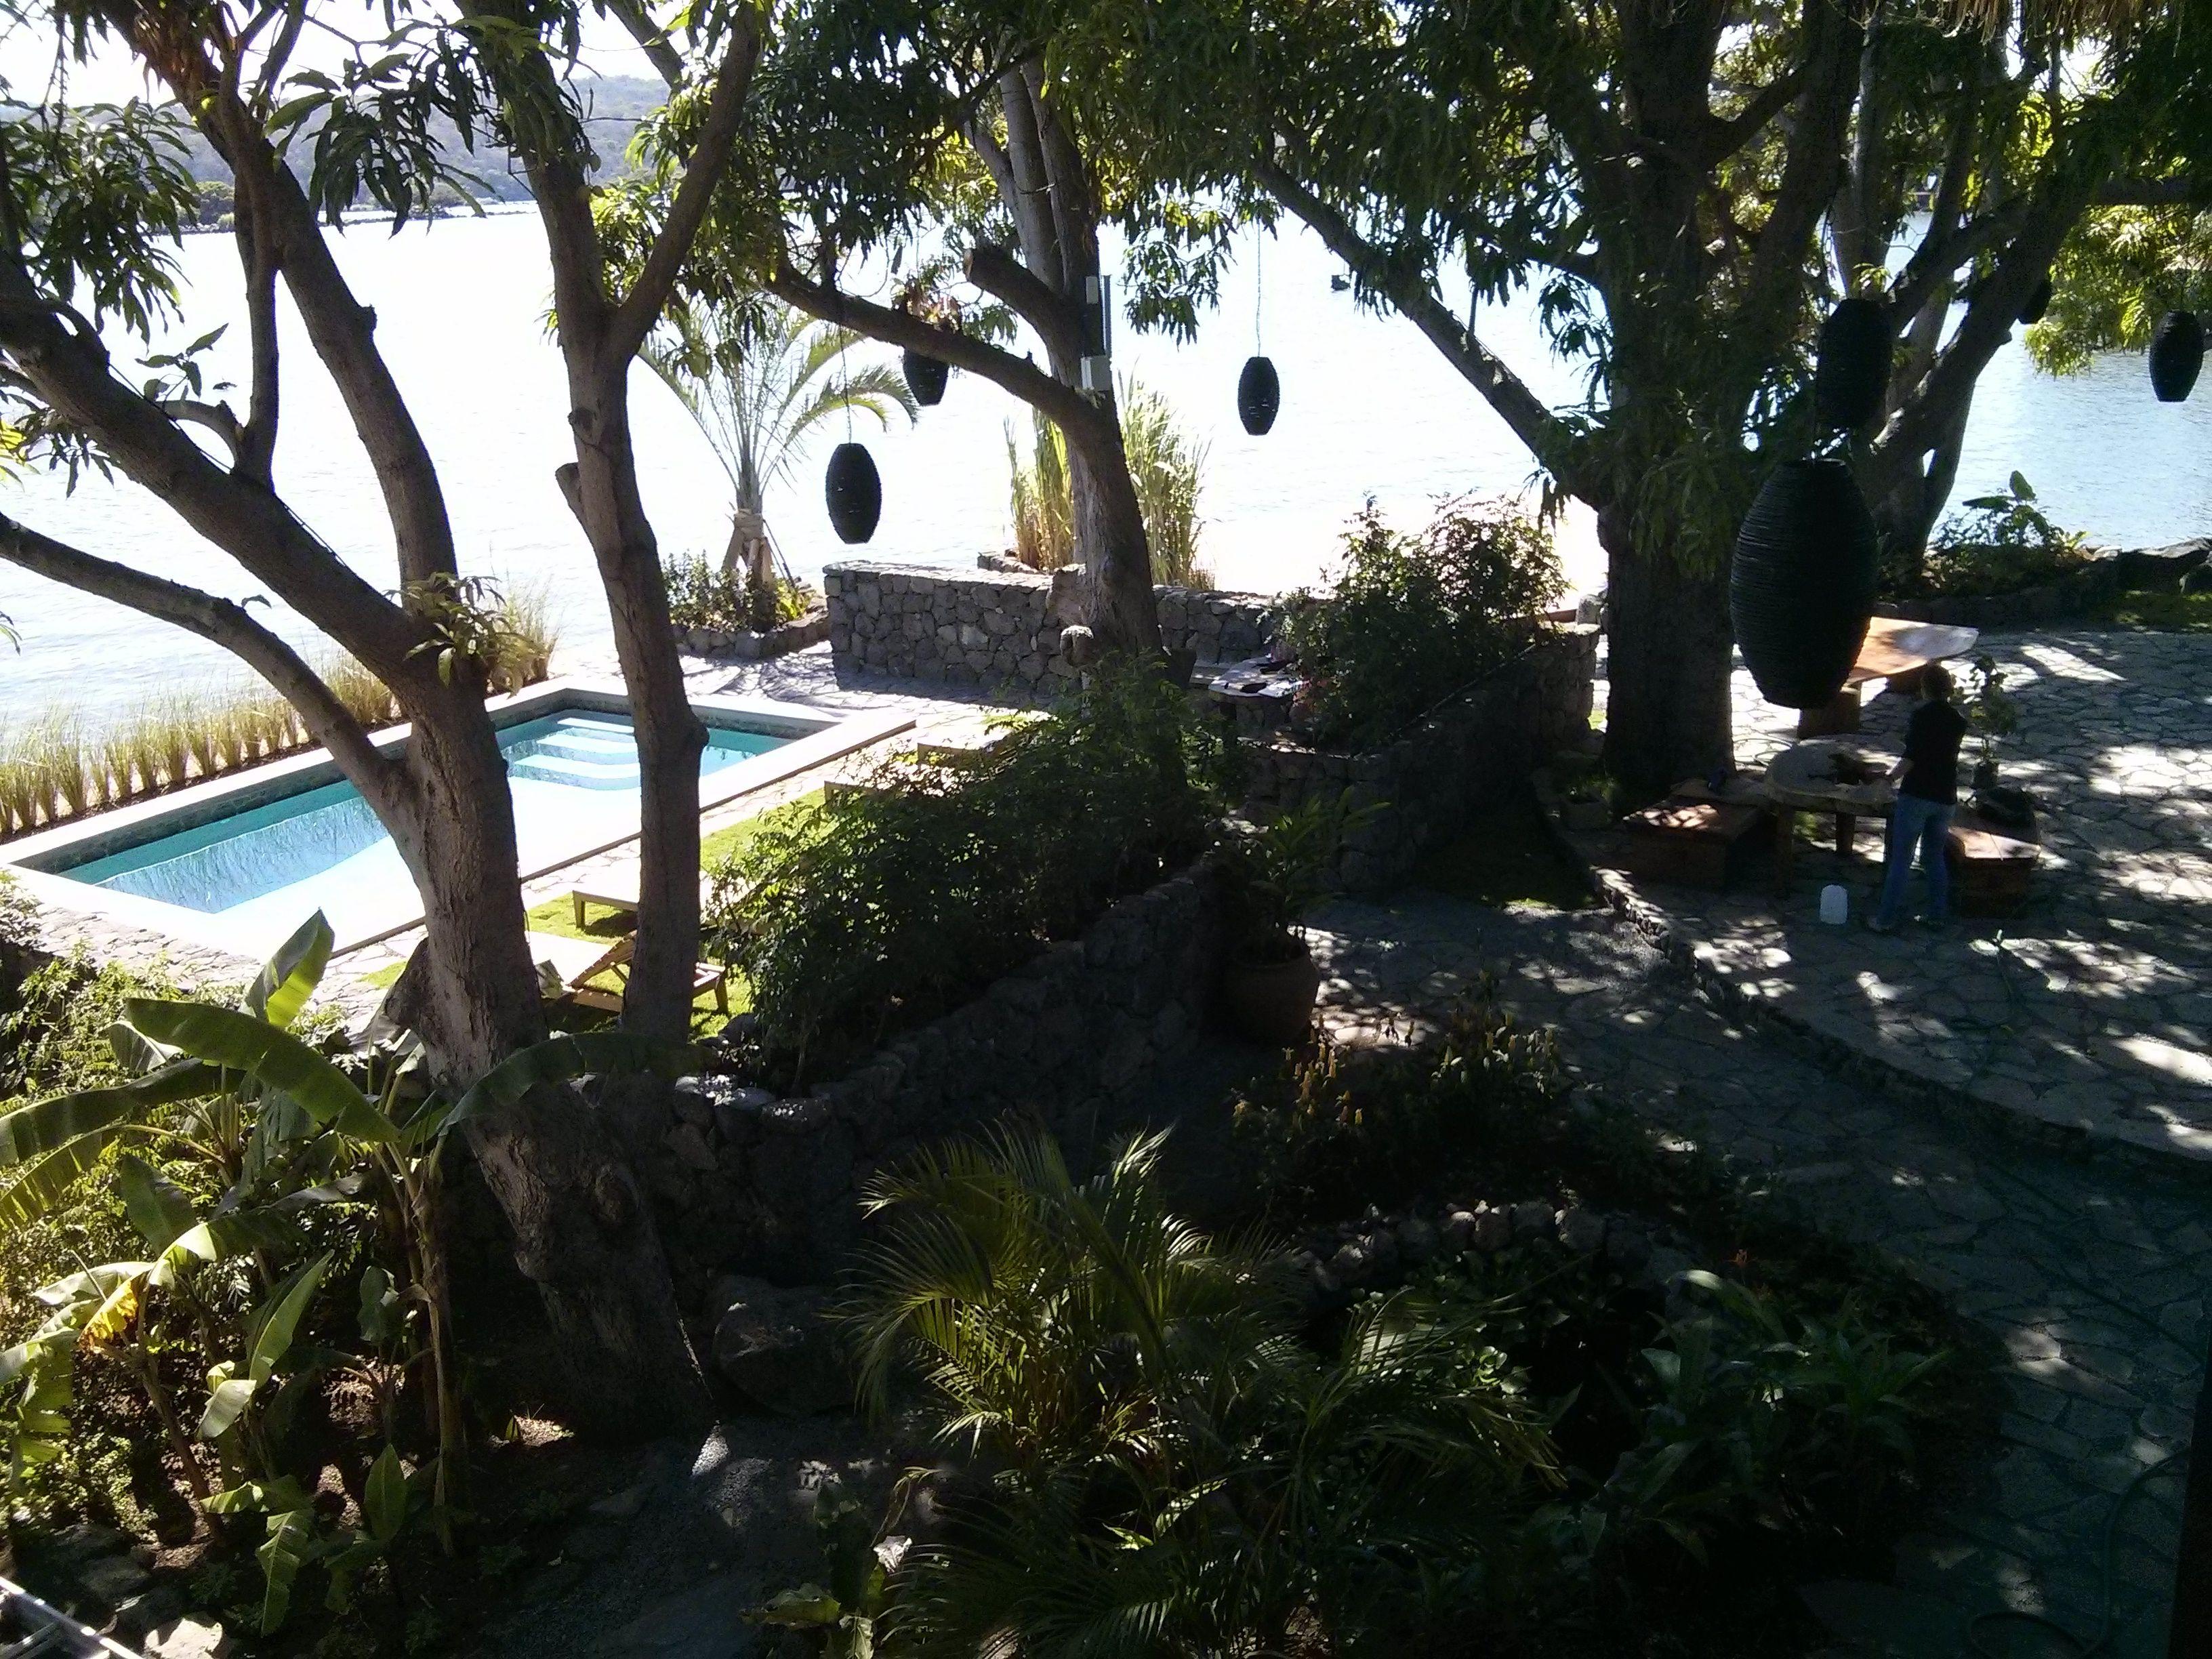 Gardens to pool area.